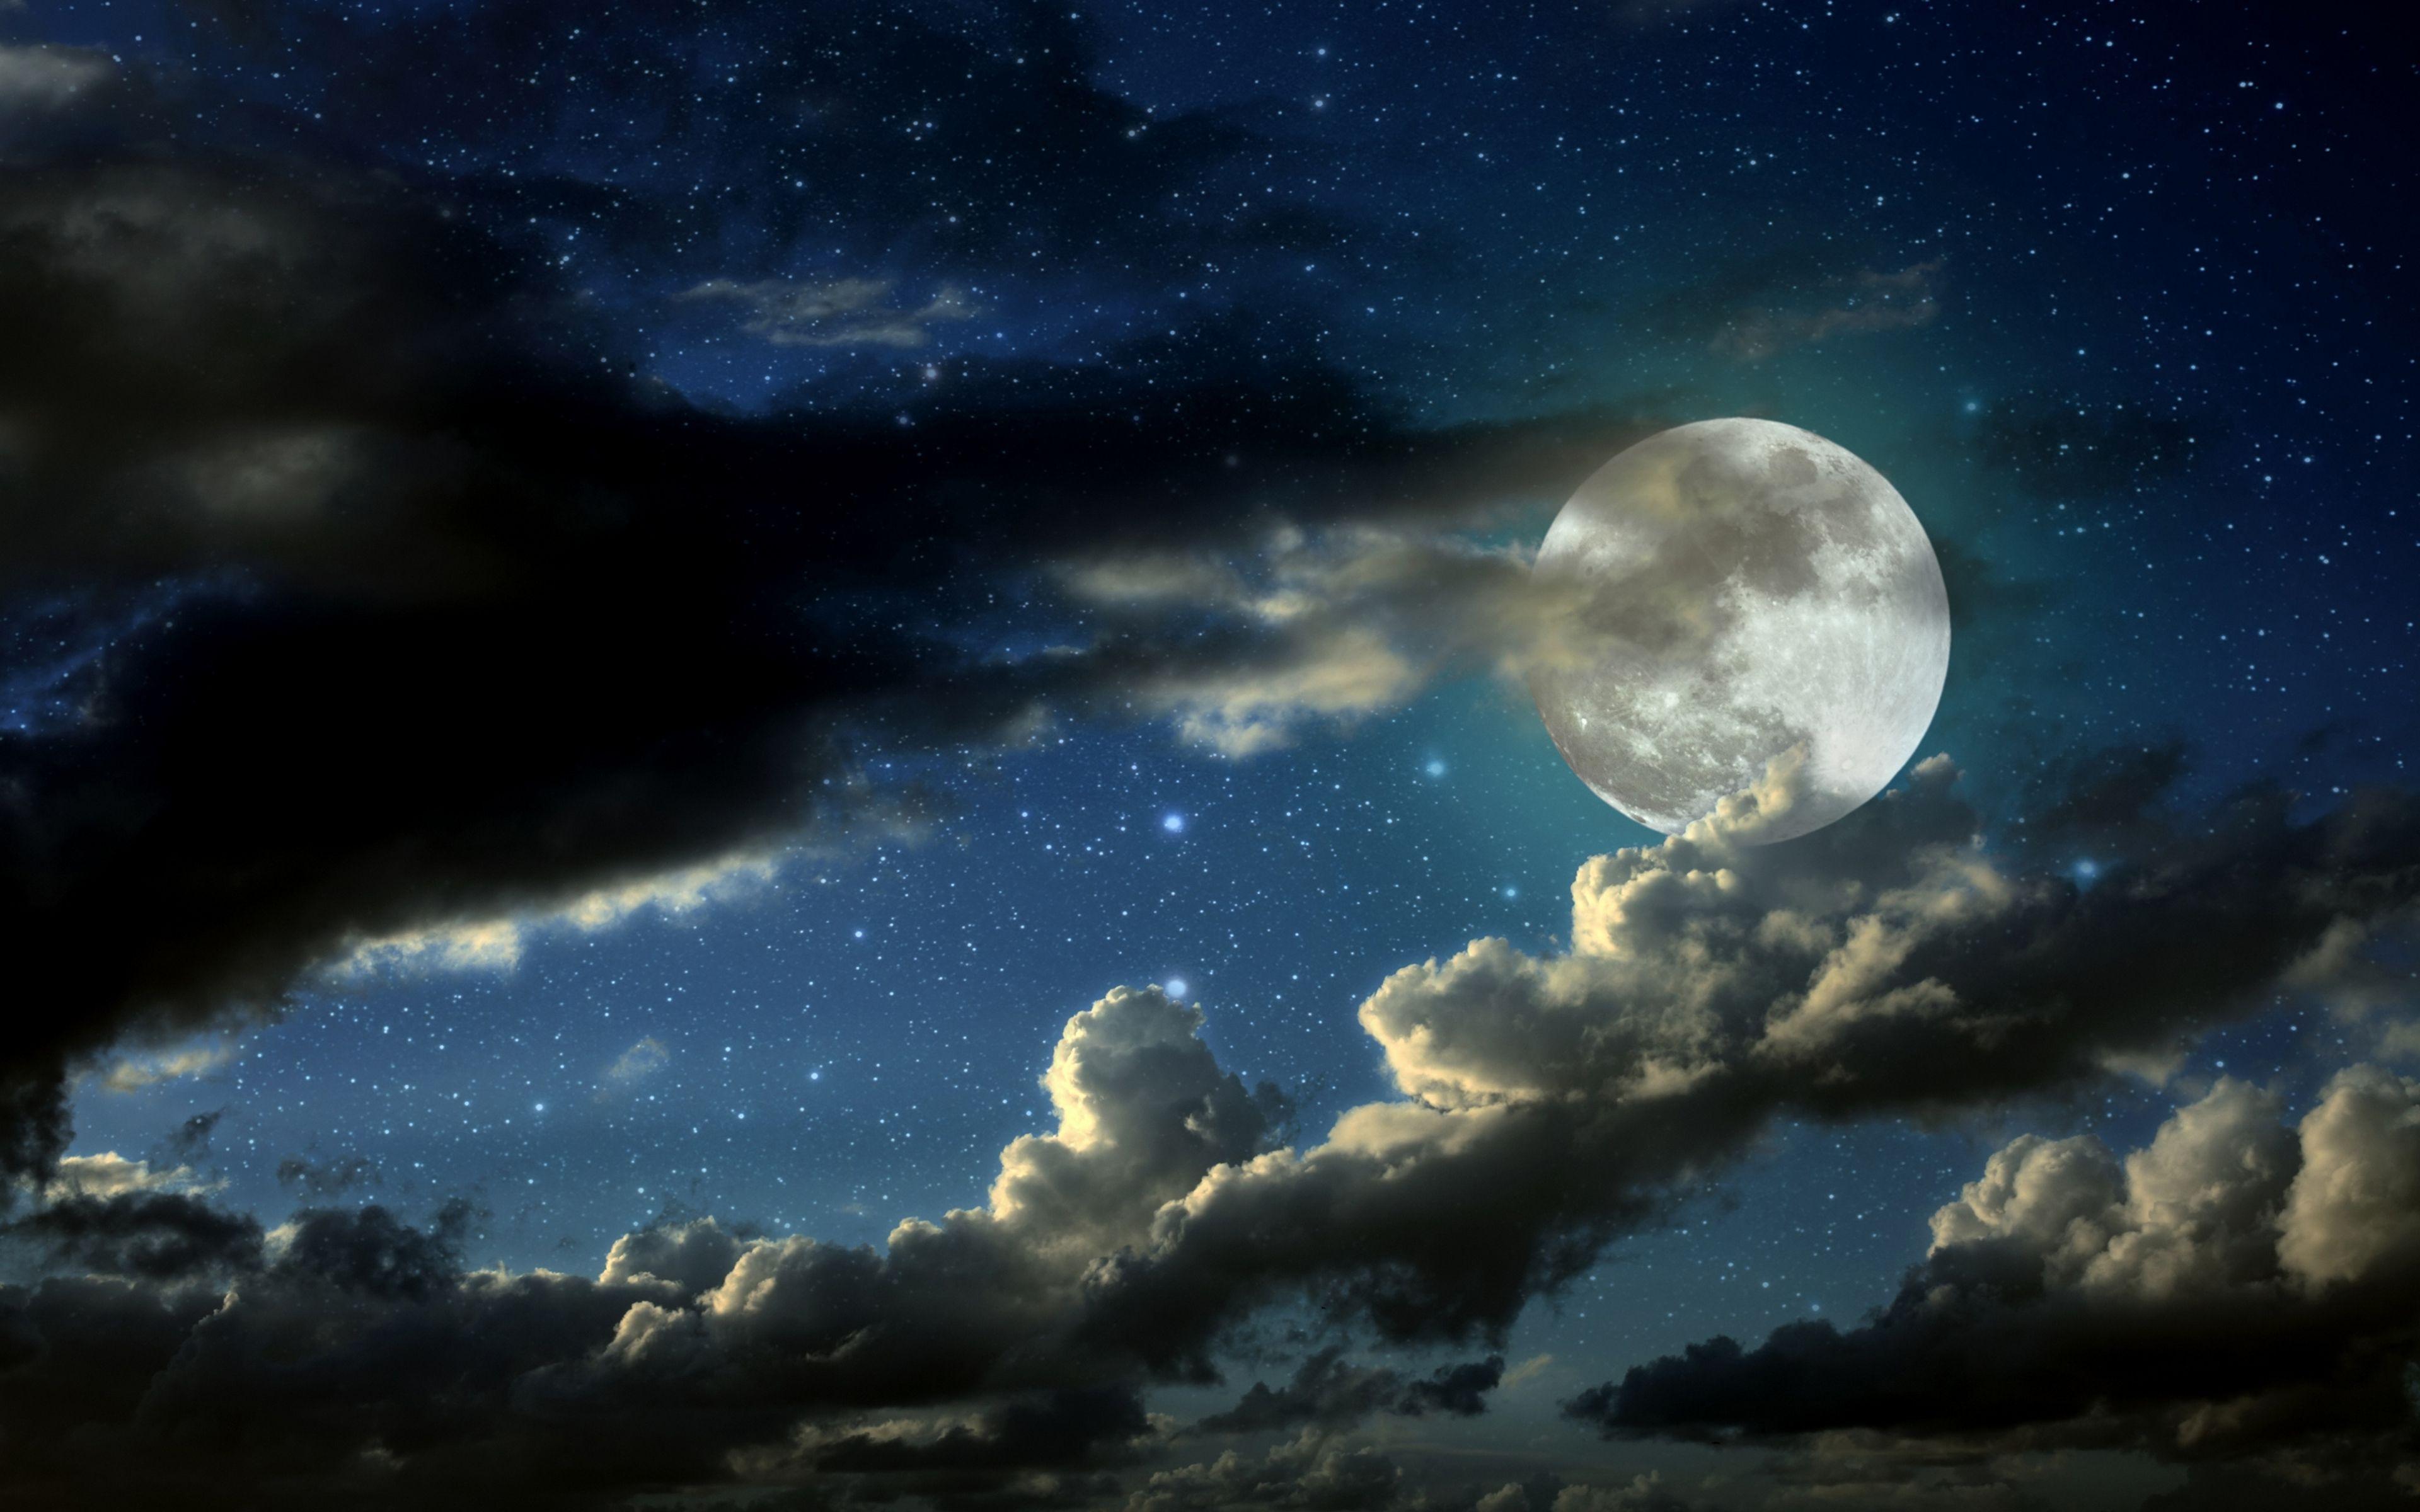 3840x2400 Wallpaper Full Moon Stars Clouds Shadows Night Sky Wallpaper Full Moon Night Stars And Moon